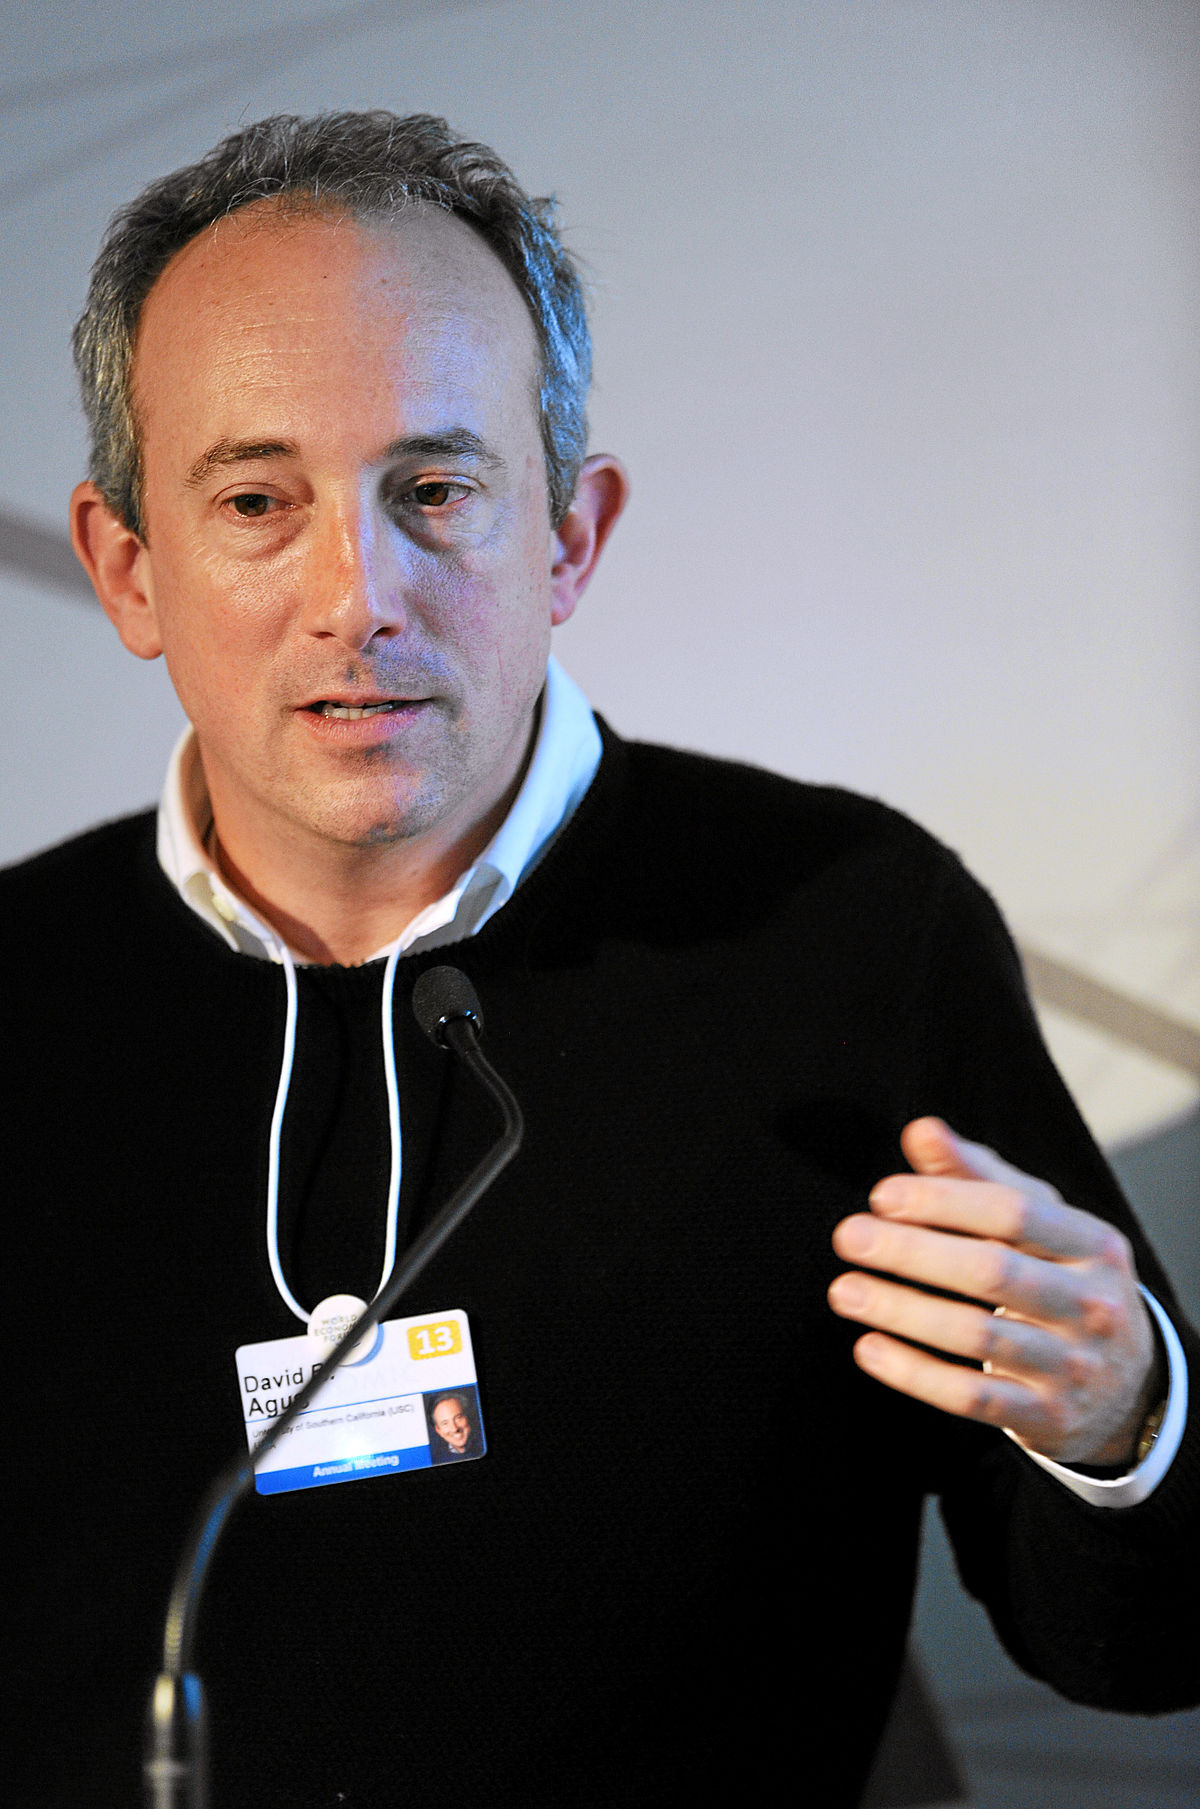 David Agus Wikipedia